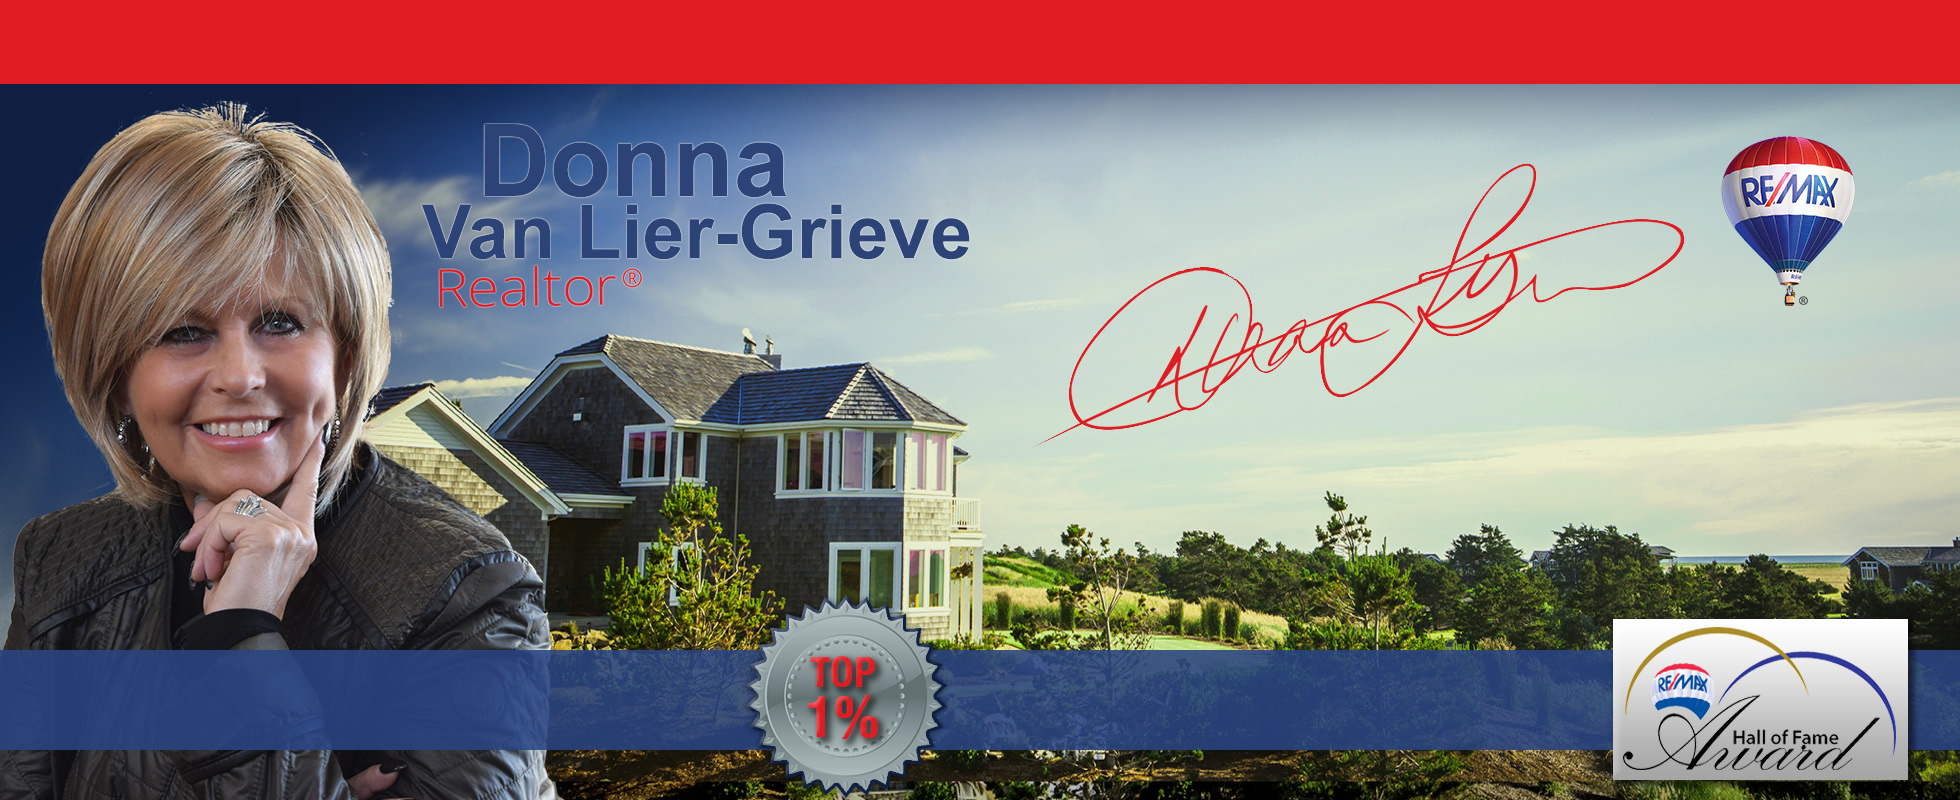 Donna Van Lier-Grieve